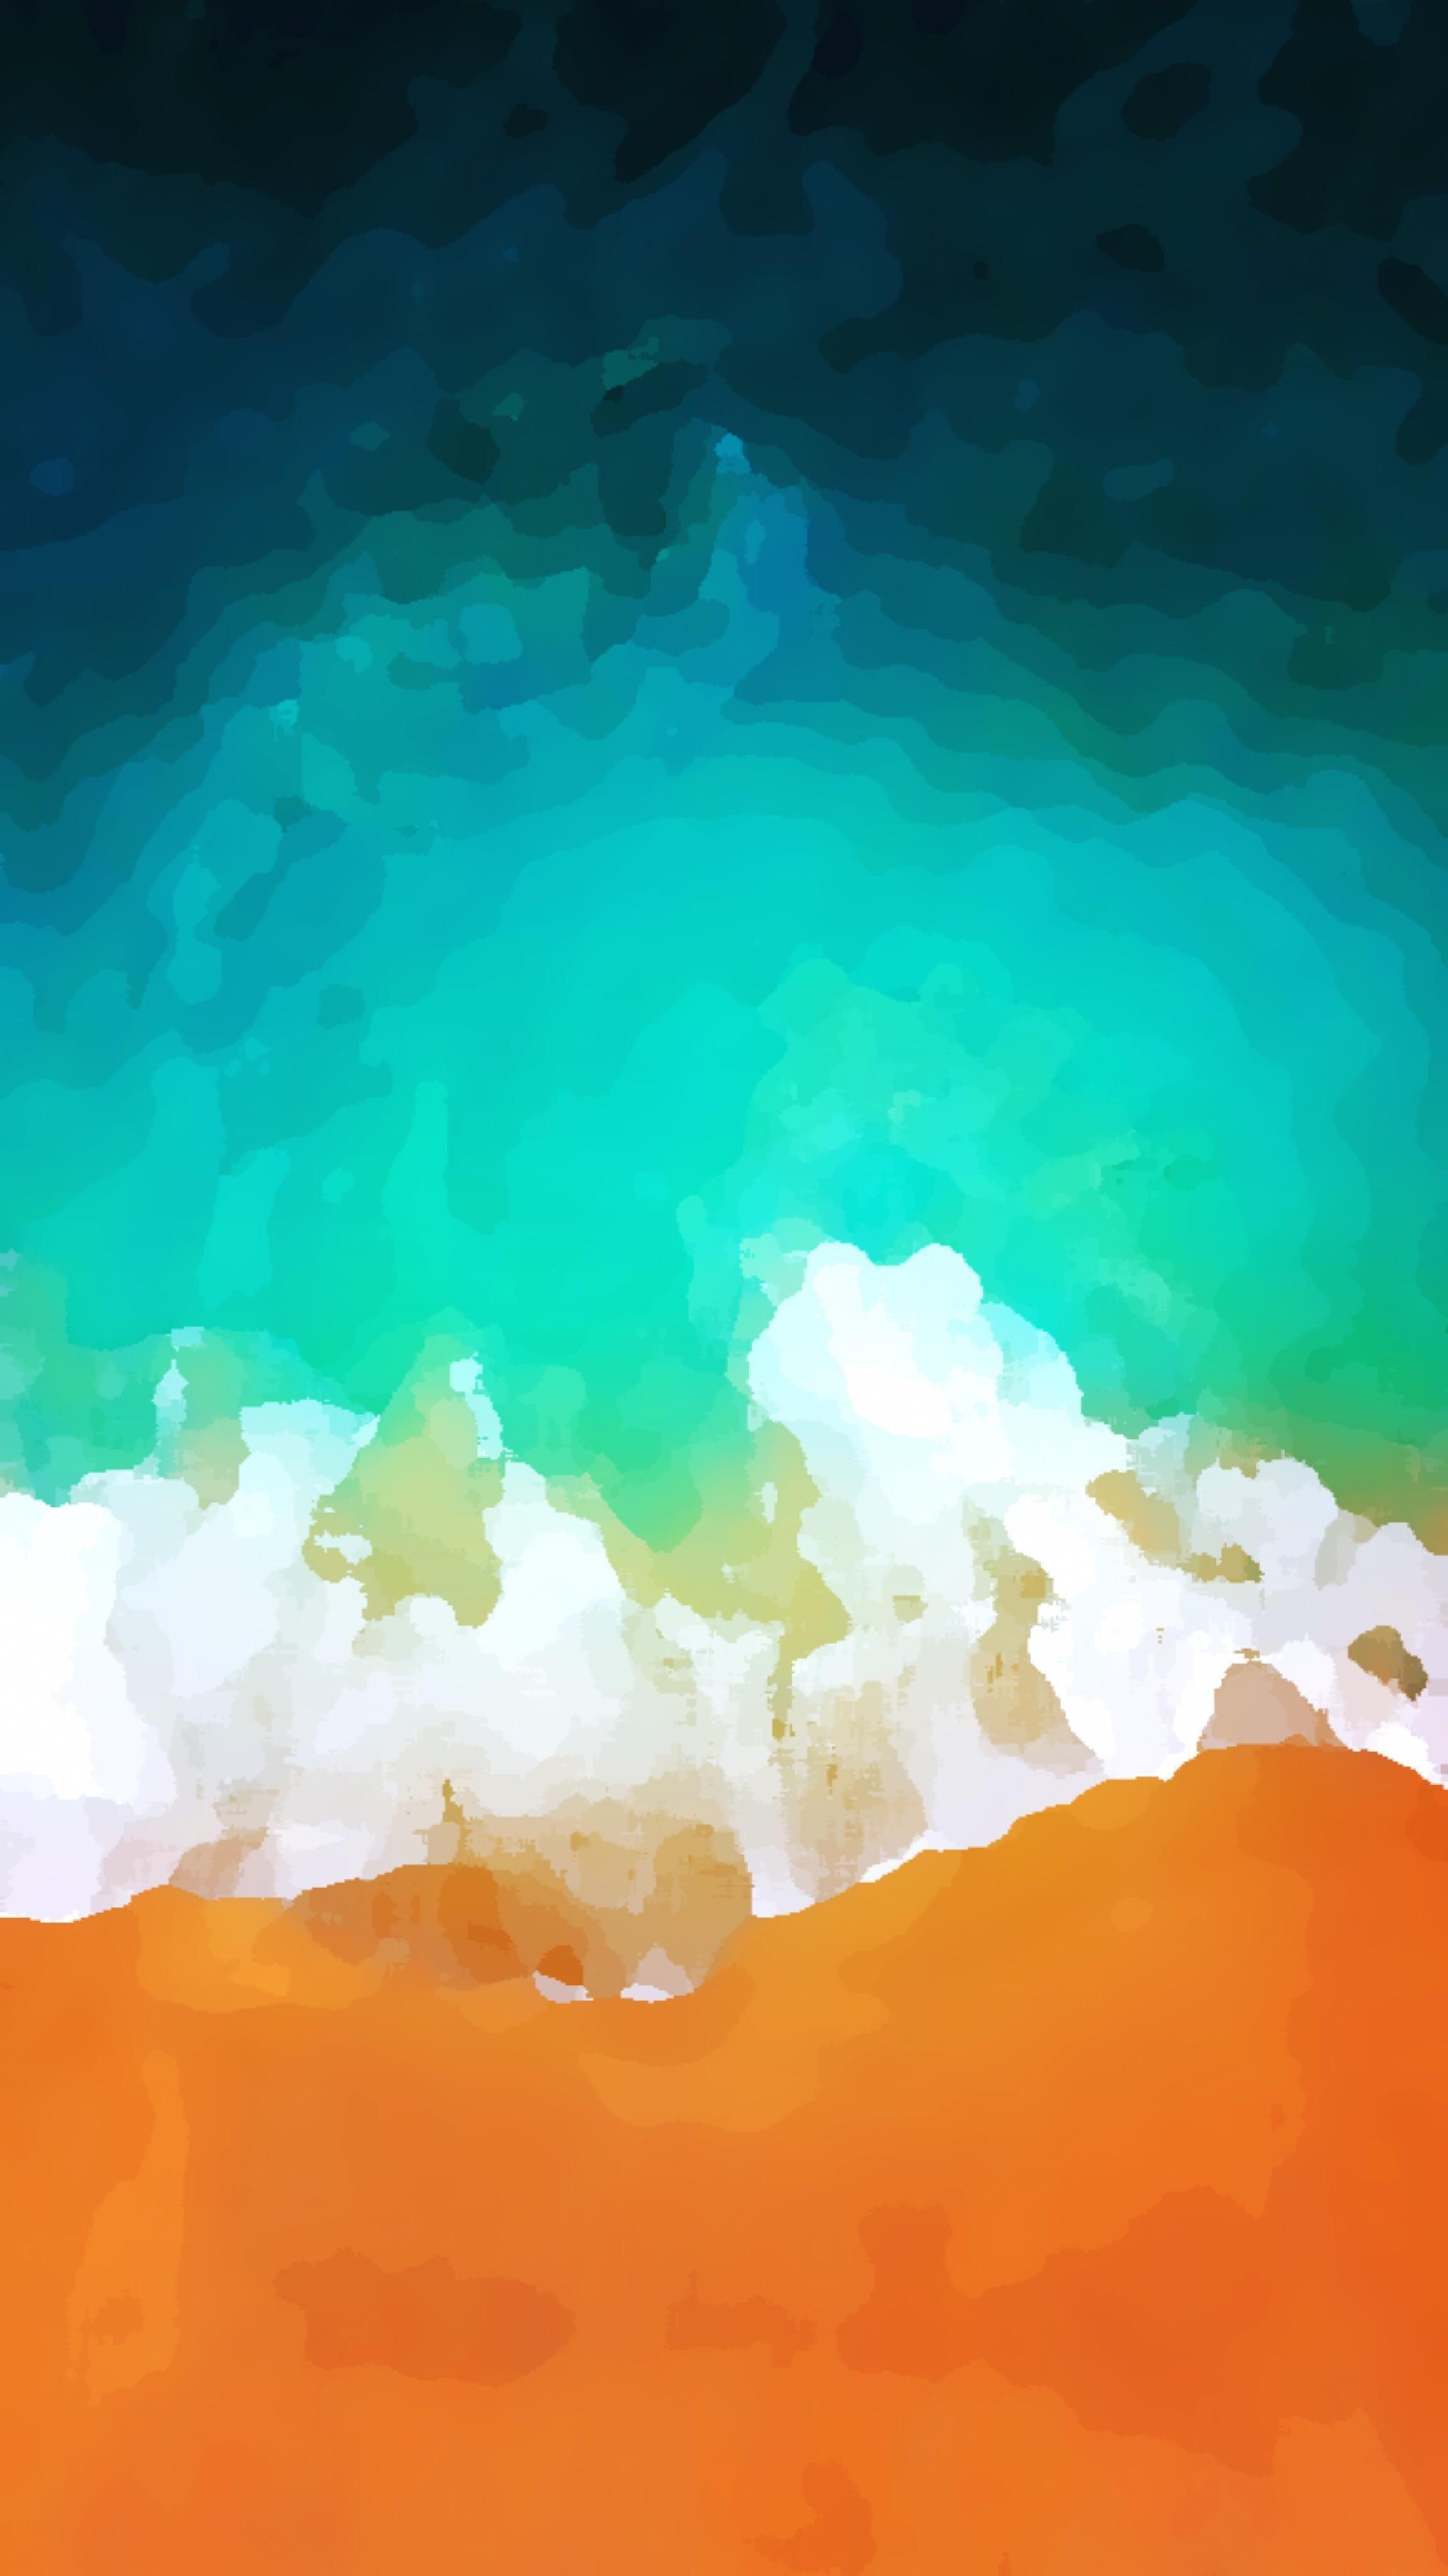 Abstract iphone wallpaper, Iphone wallpaper